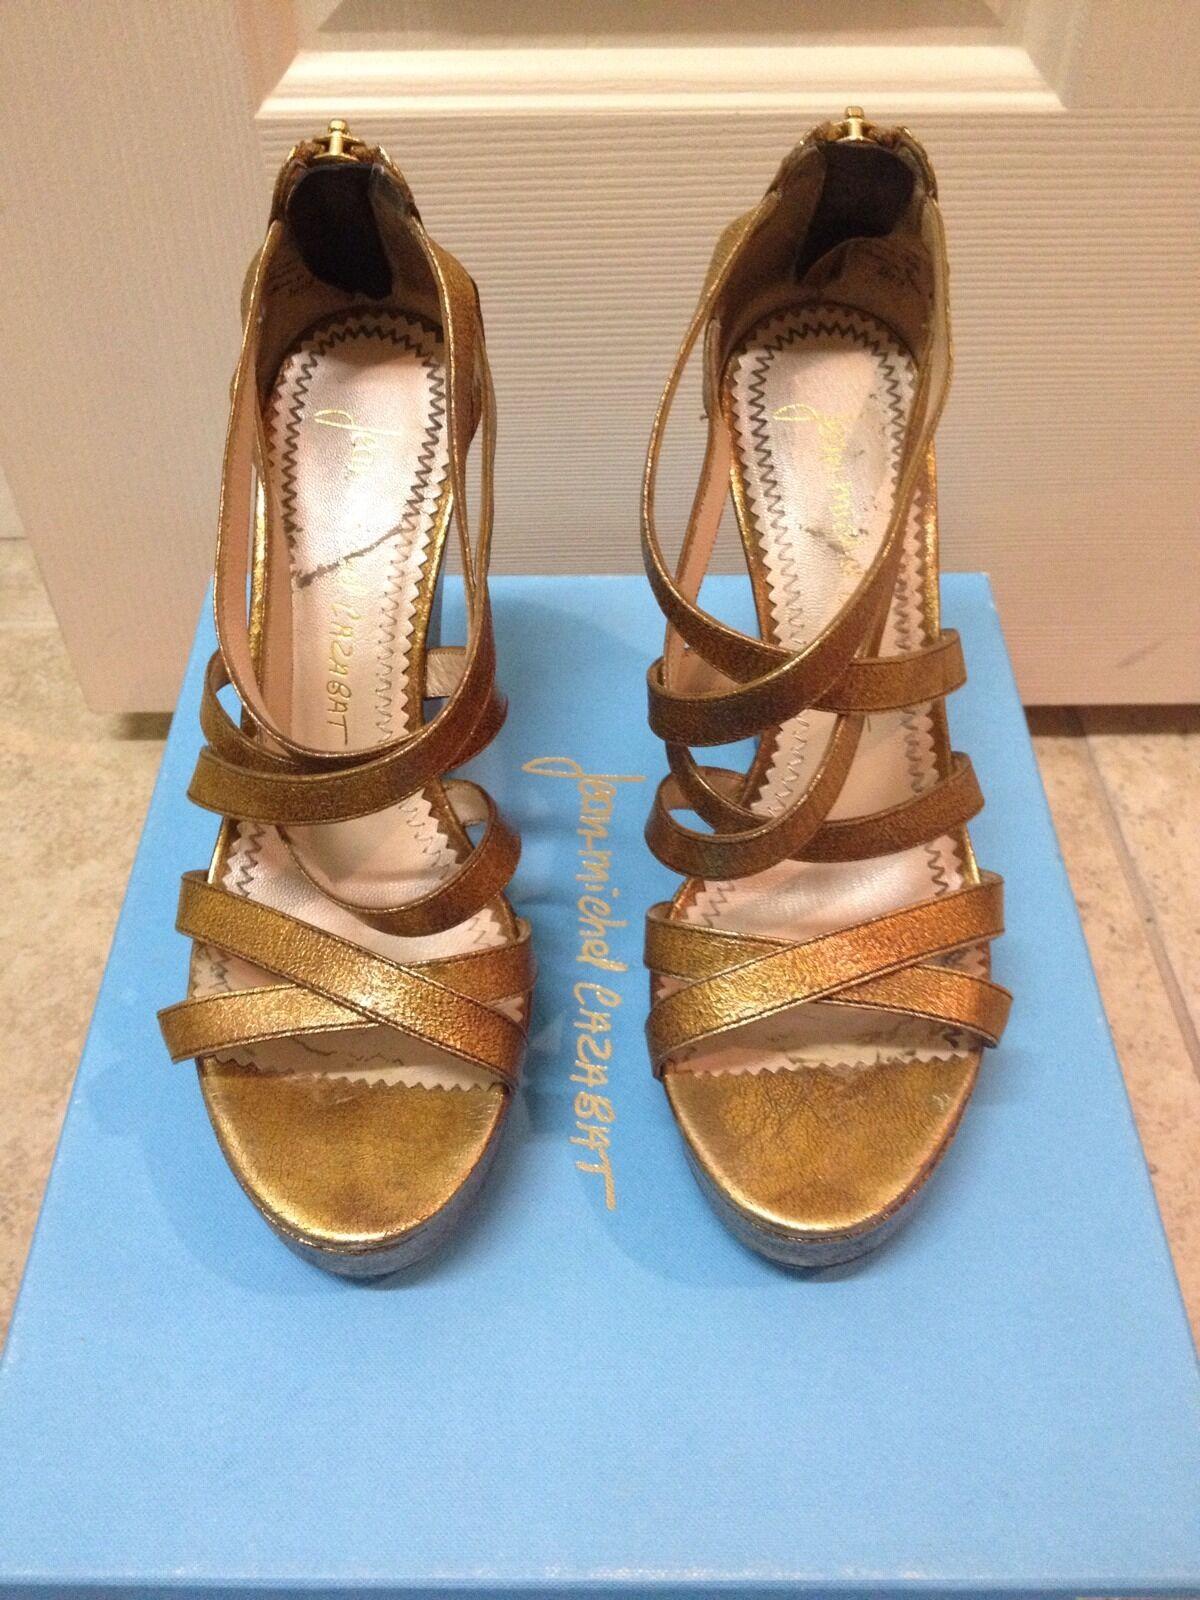 Jean -Michel Cazabat Willow Wedges Storlek 36.5 Neiman Marcus  395 Platform Sandals